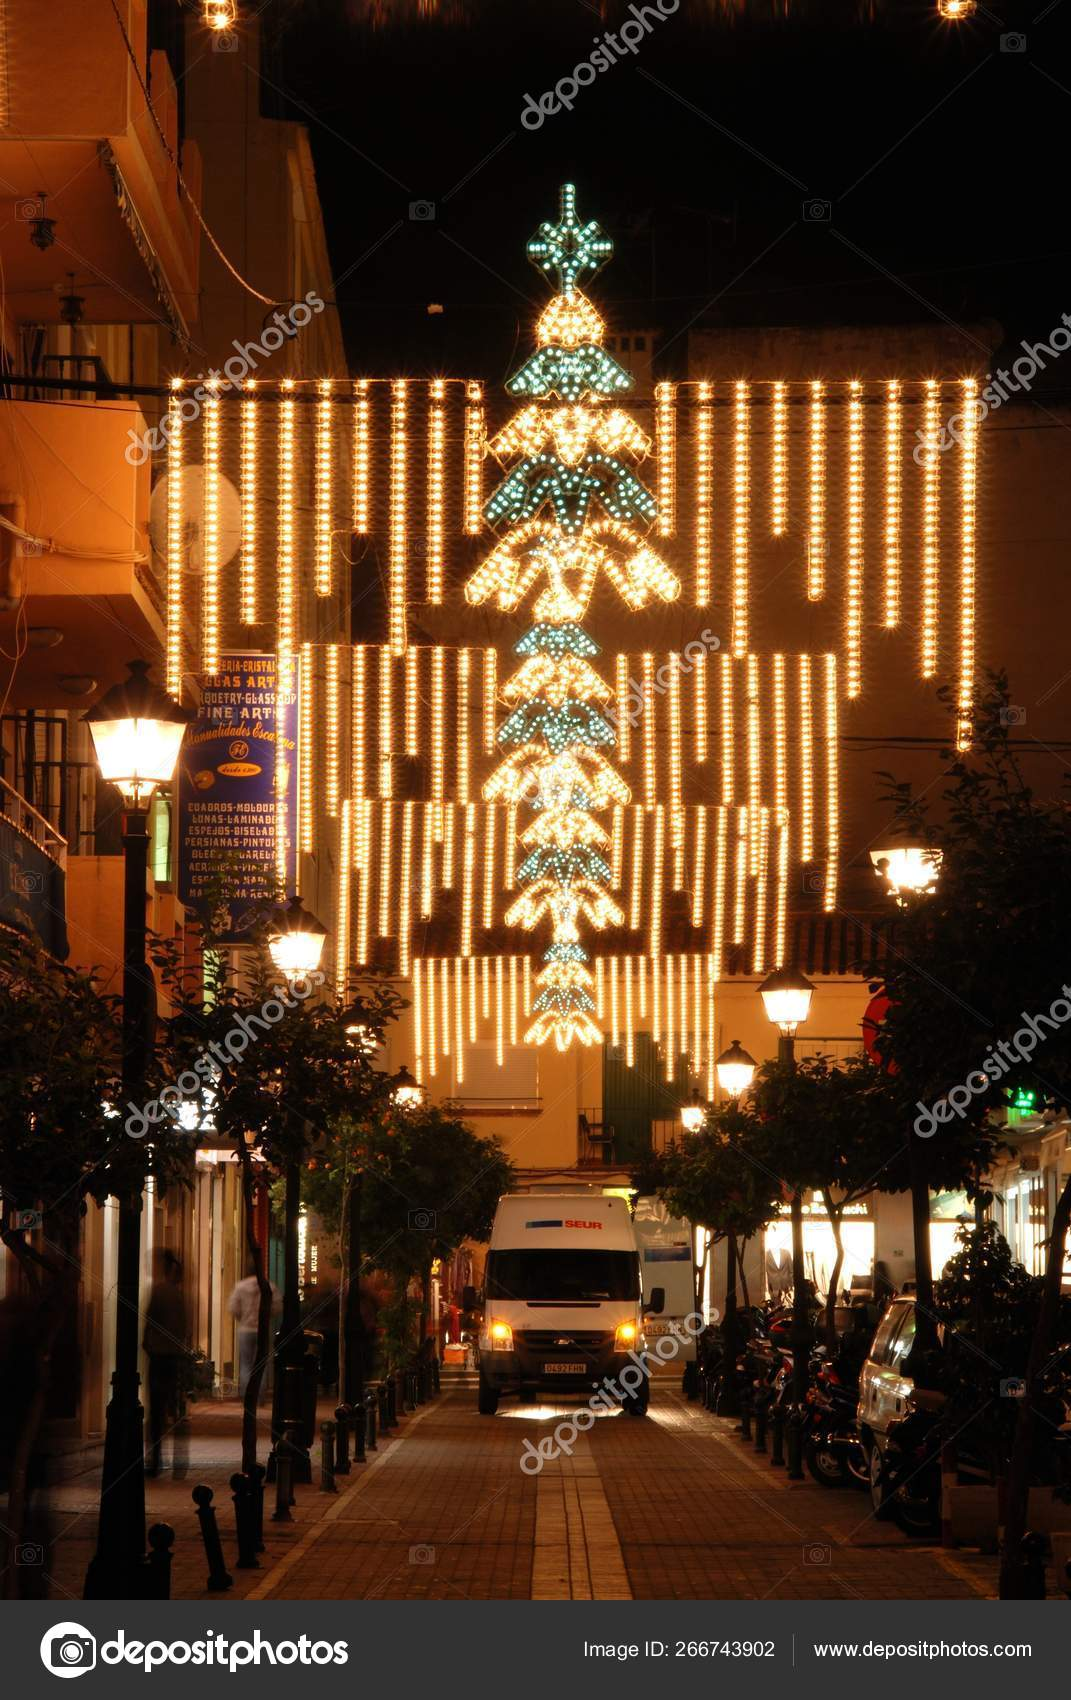 Christmas Decorations Along A Town Centre Street At Night Fuengirola Spain Stock Editorial Photo C Arenaphotouk 266743902